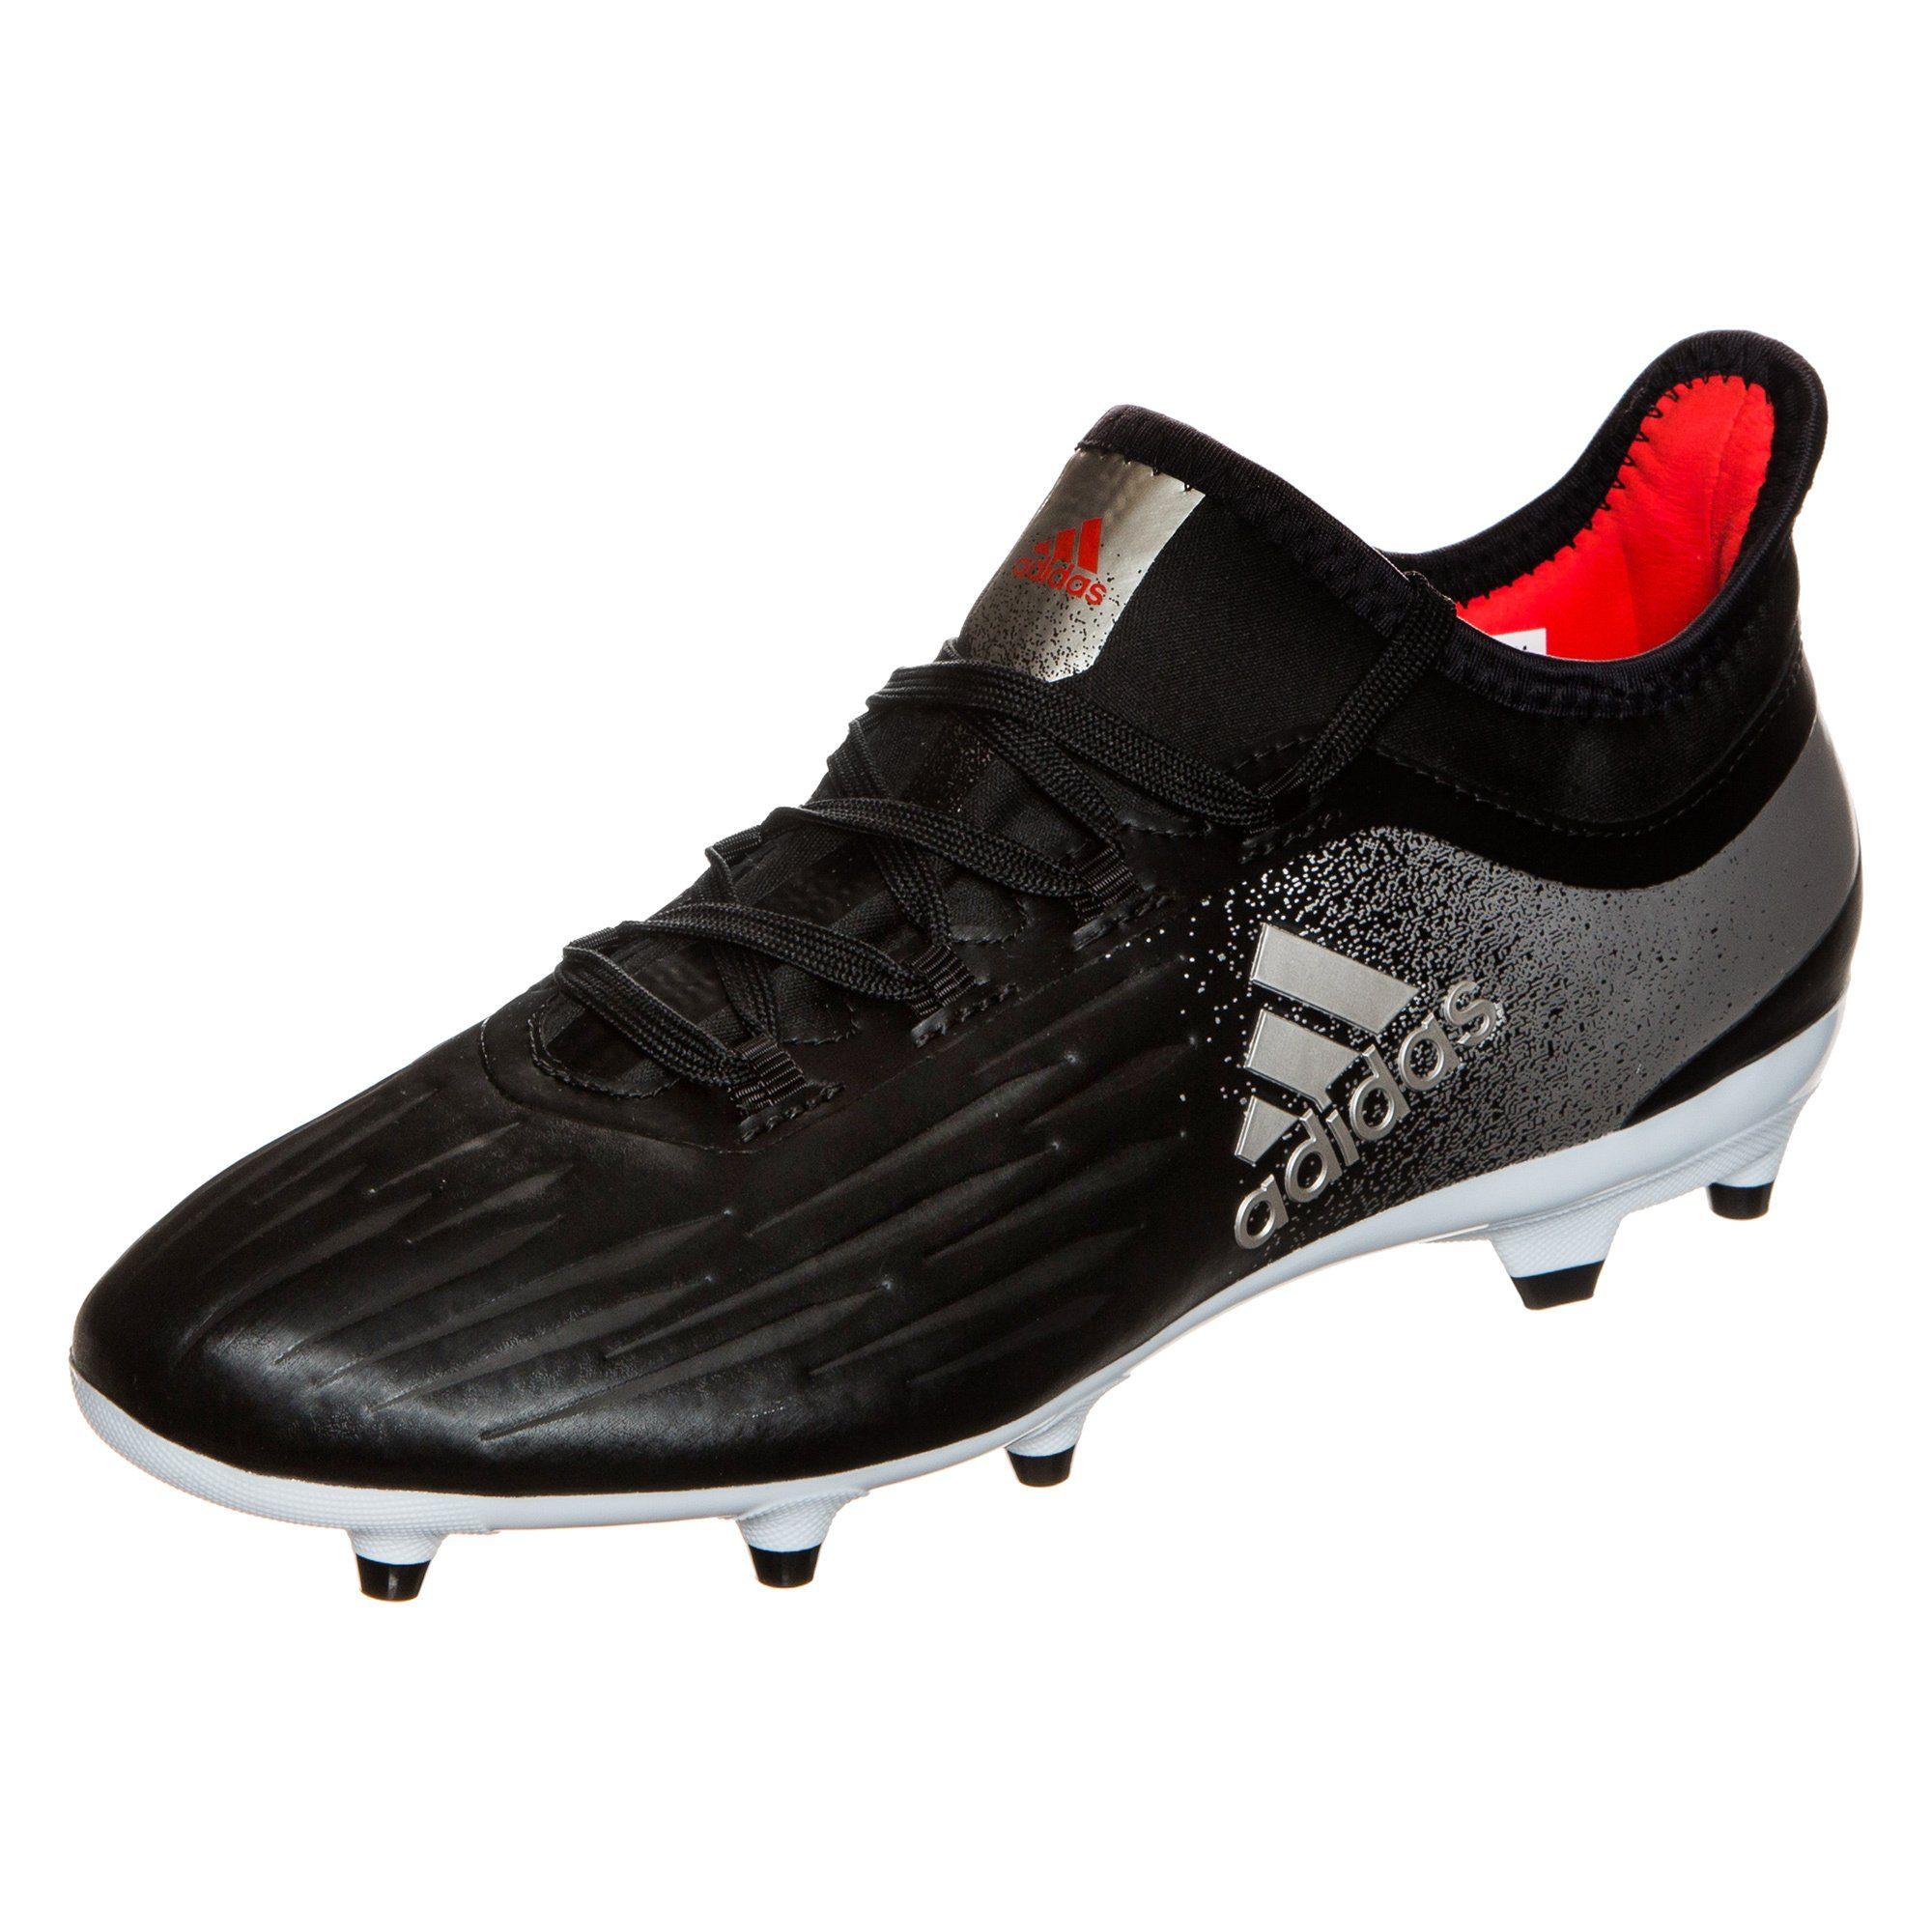 adidas Performance X 172 FG Fußballschuh Damen